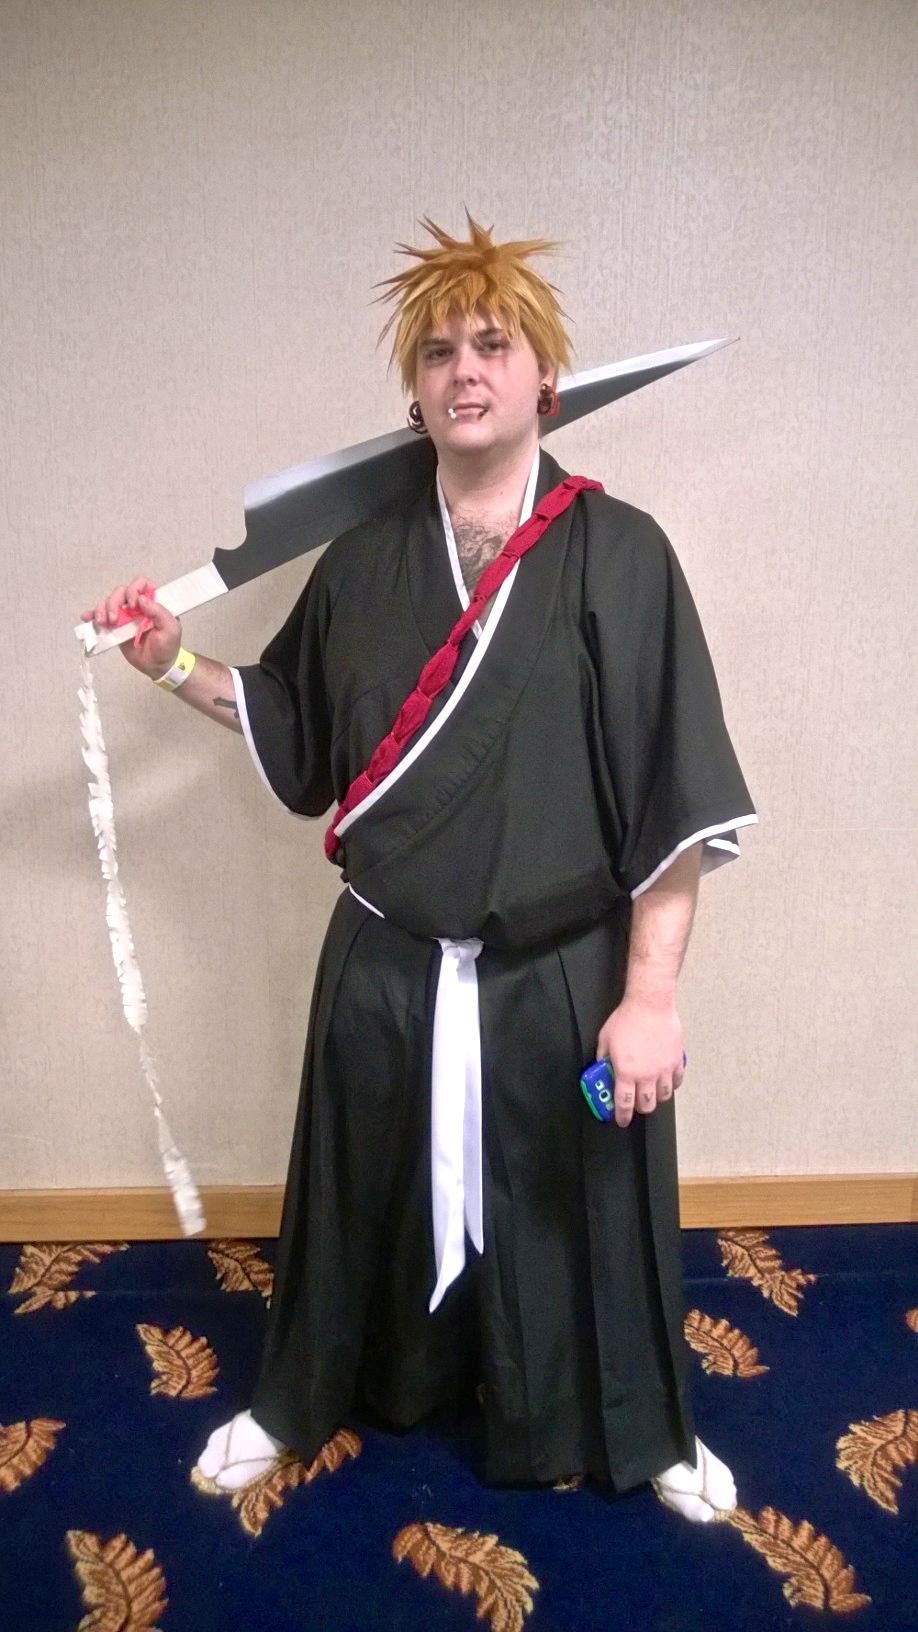 Ichigo Kurosaki from Bleach